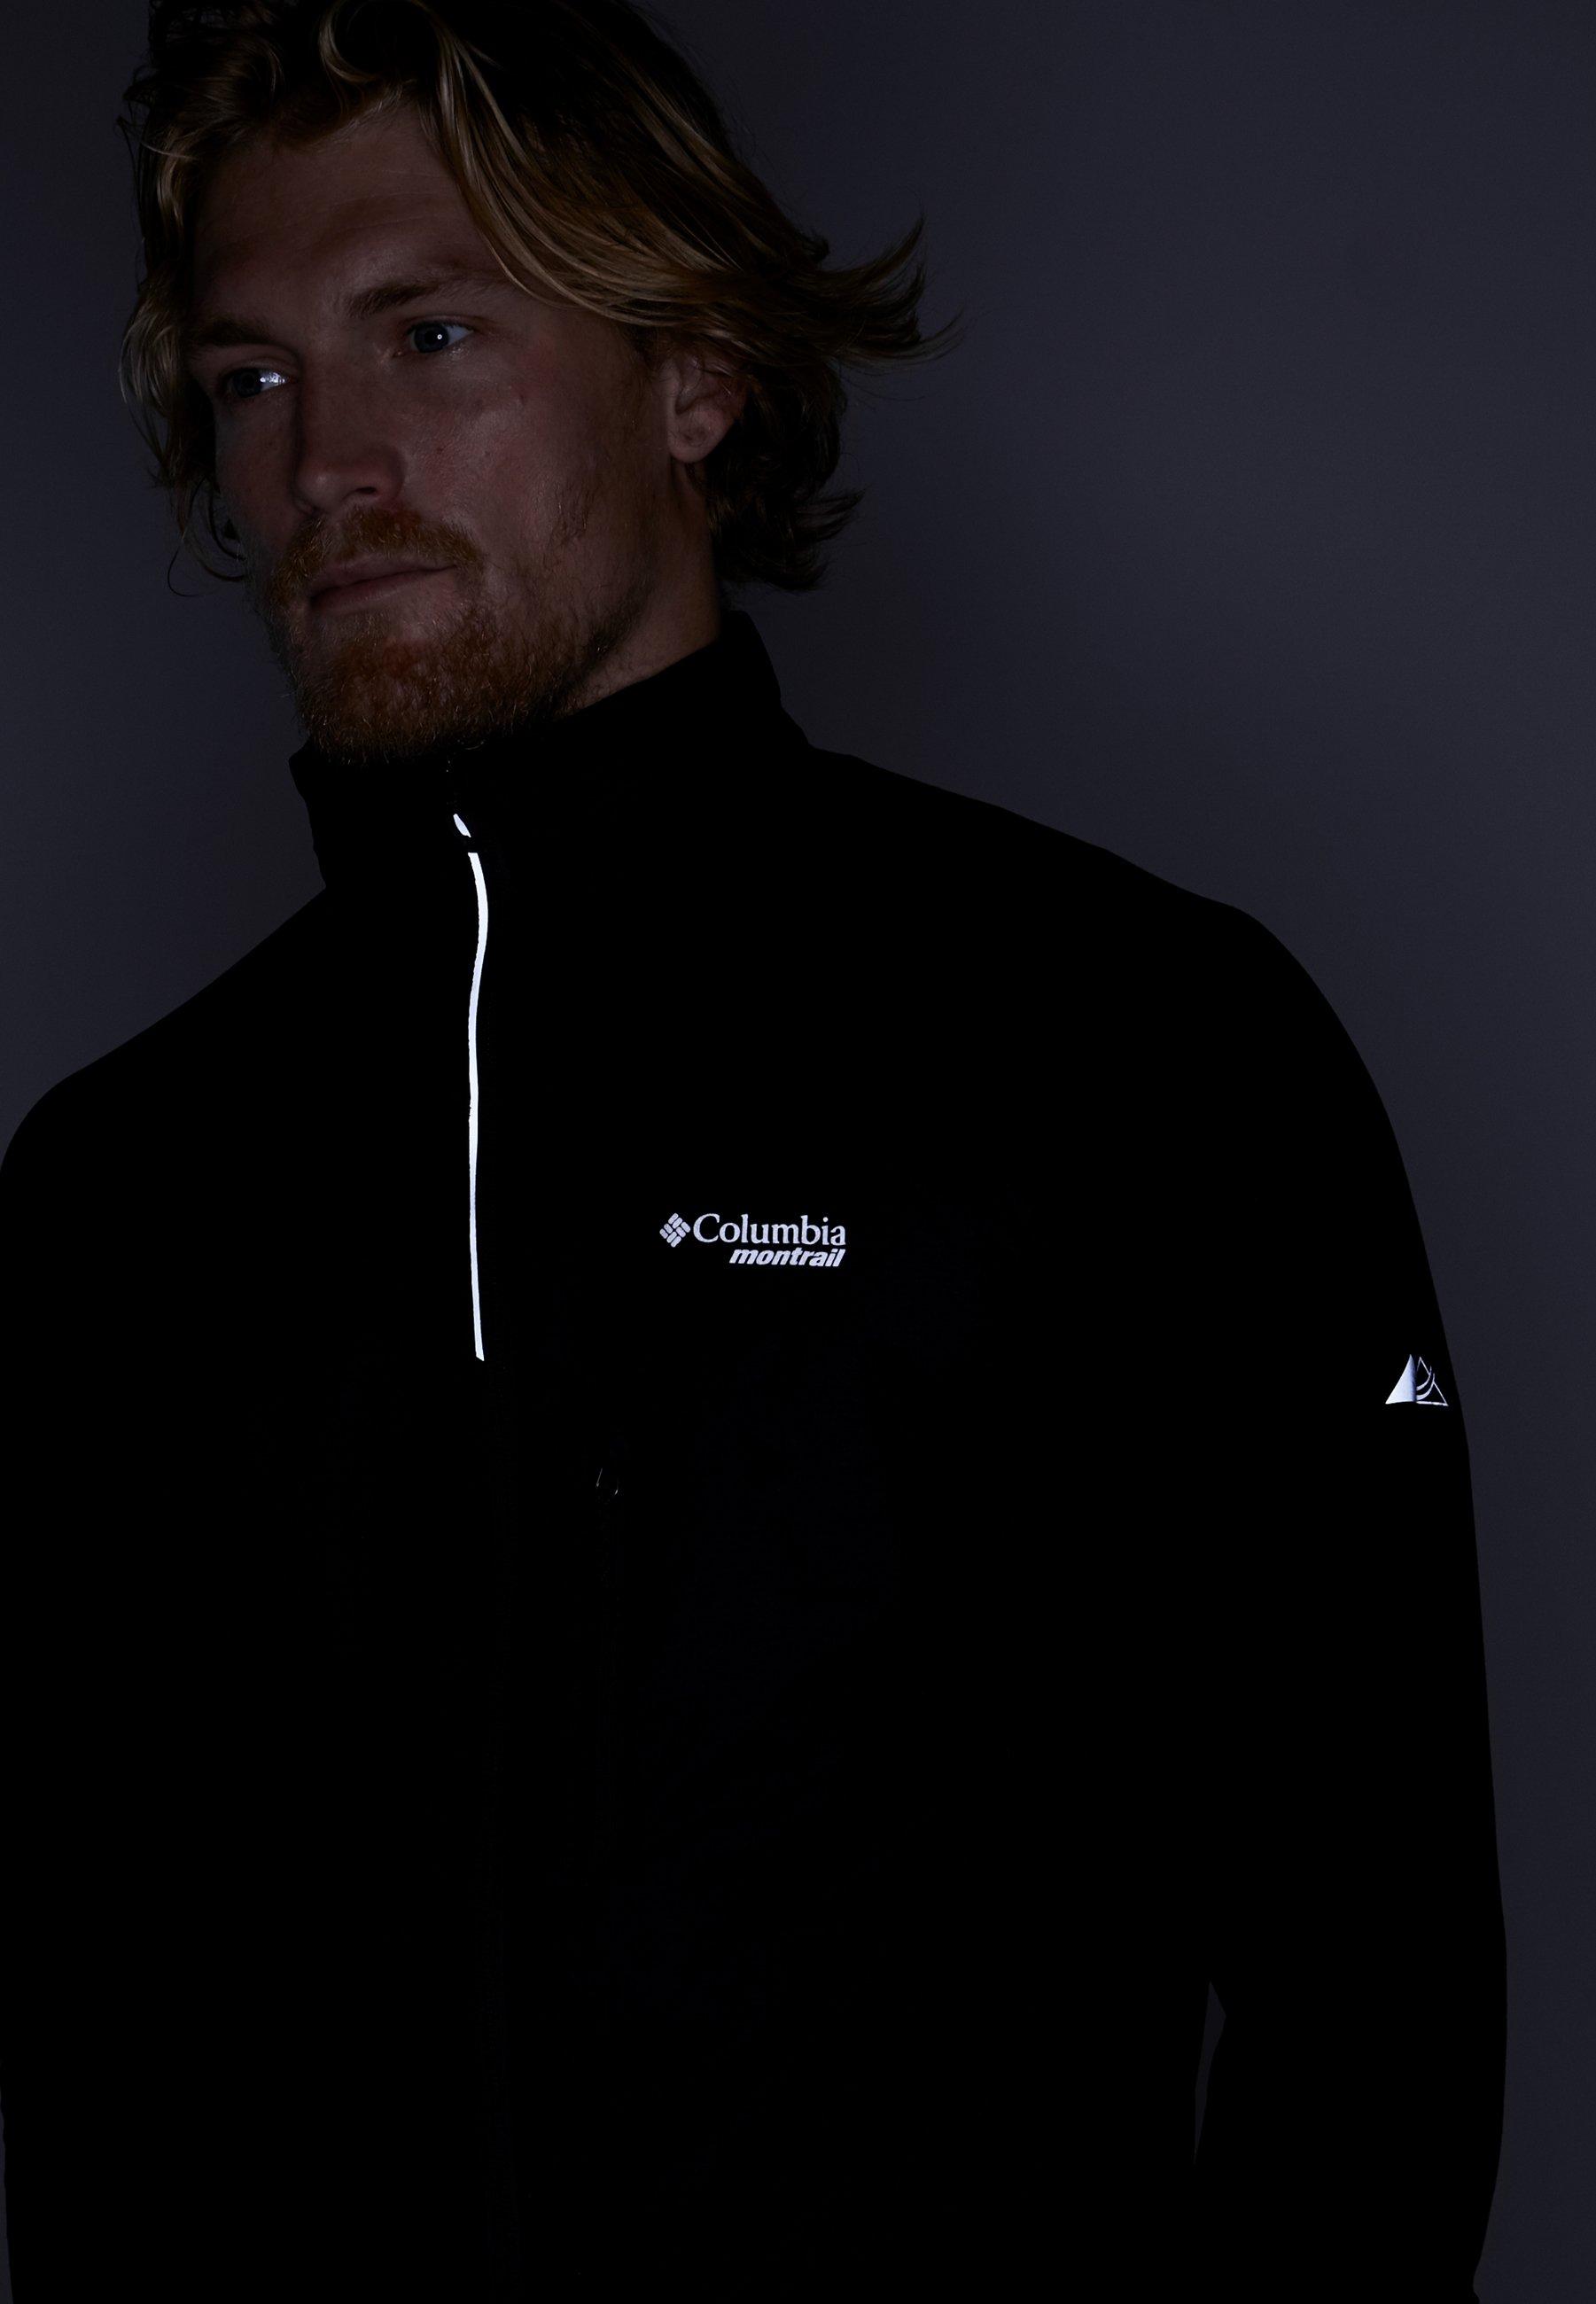 Caldorado De Columbia Black Insulated JacketVeste Running yOmNvn0w8